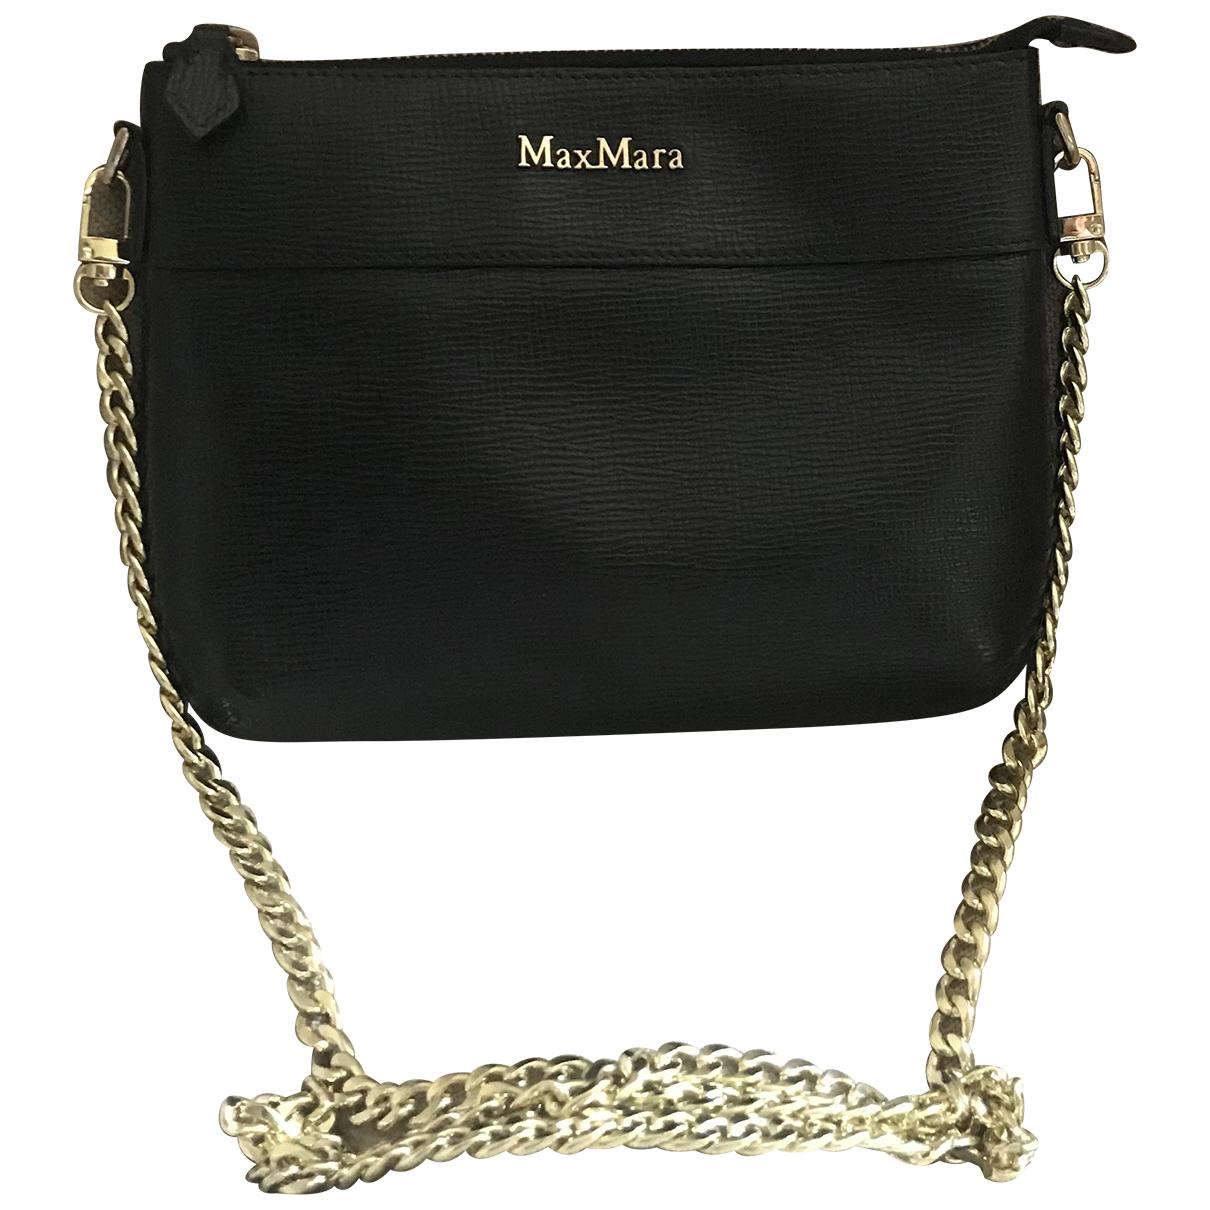 Max Mara \N Black Leather handbag for Women \N